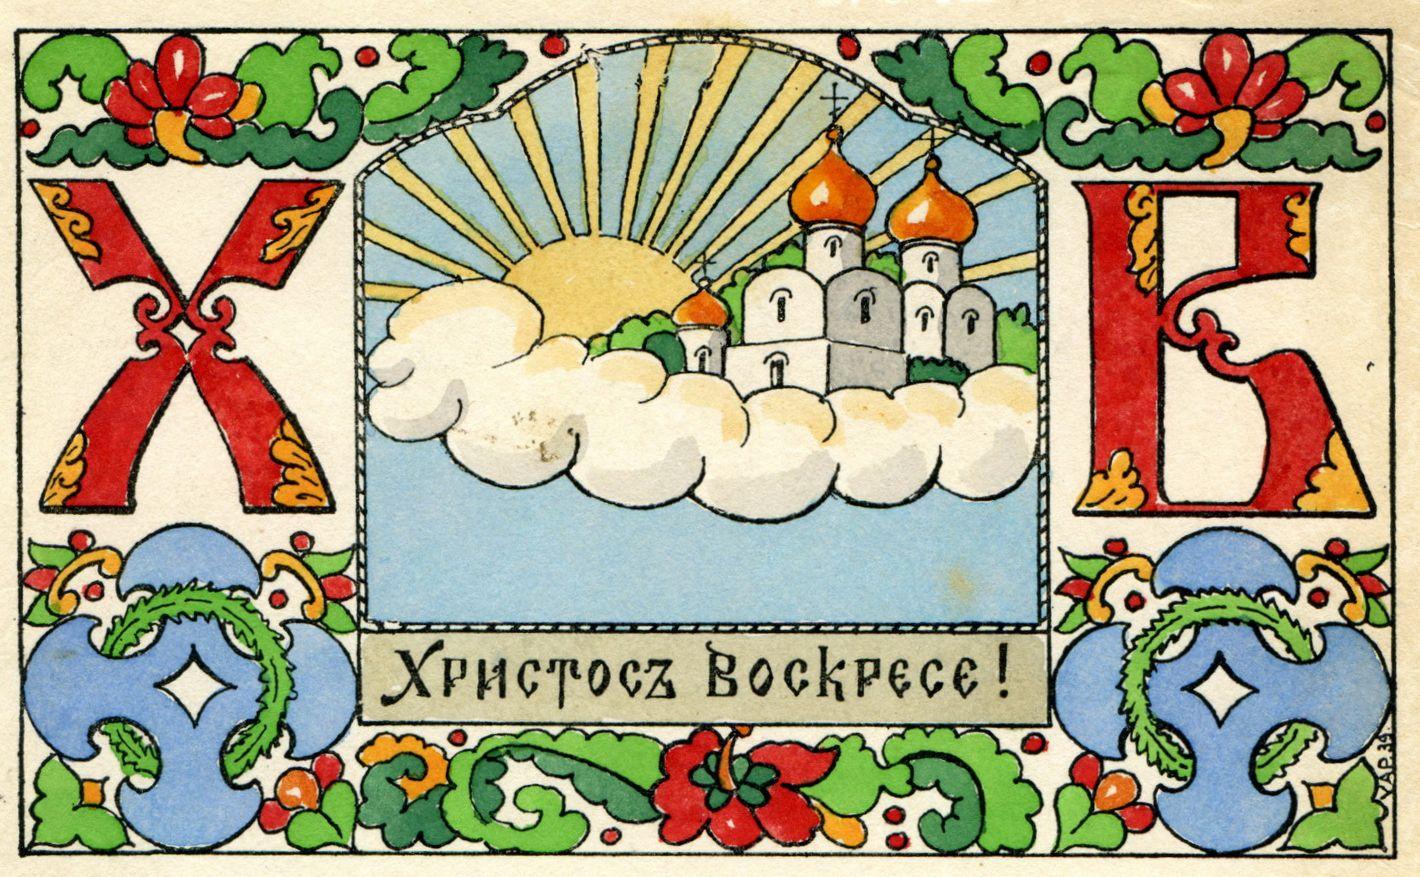 March 8 Soviet Postcard Google Search Cards Pinterest Artwork